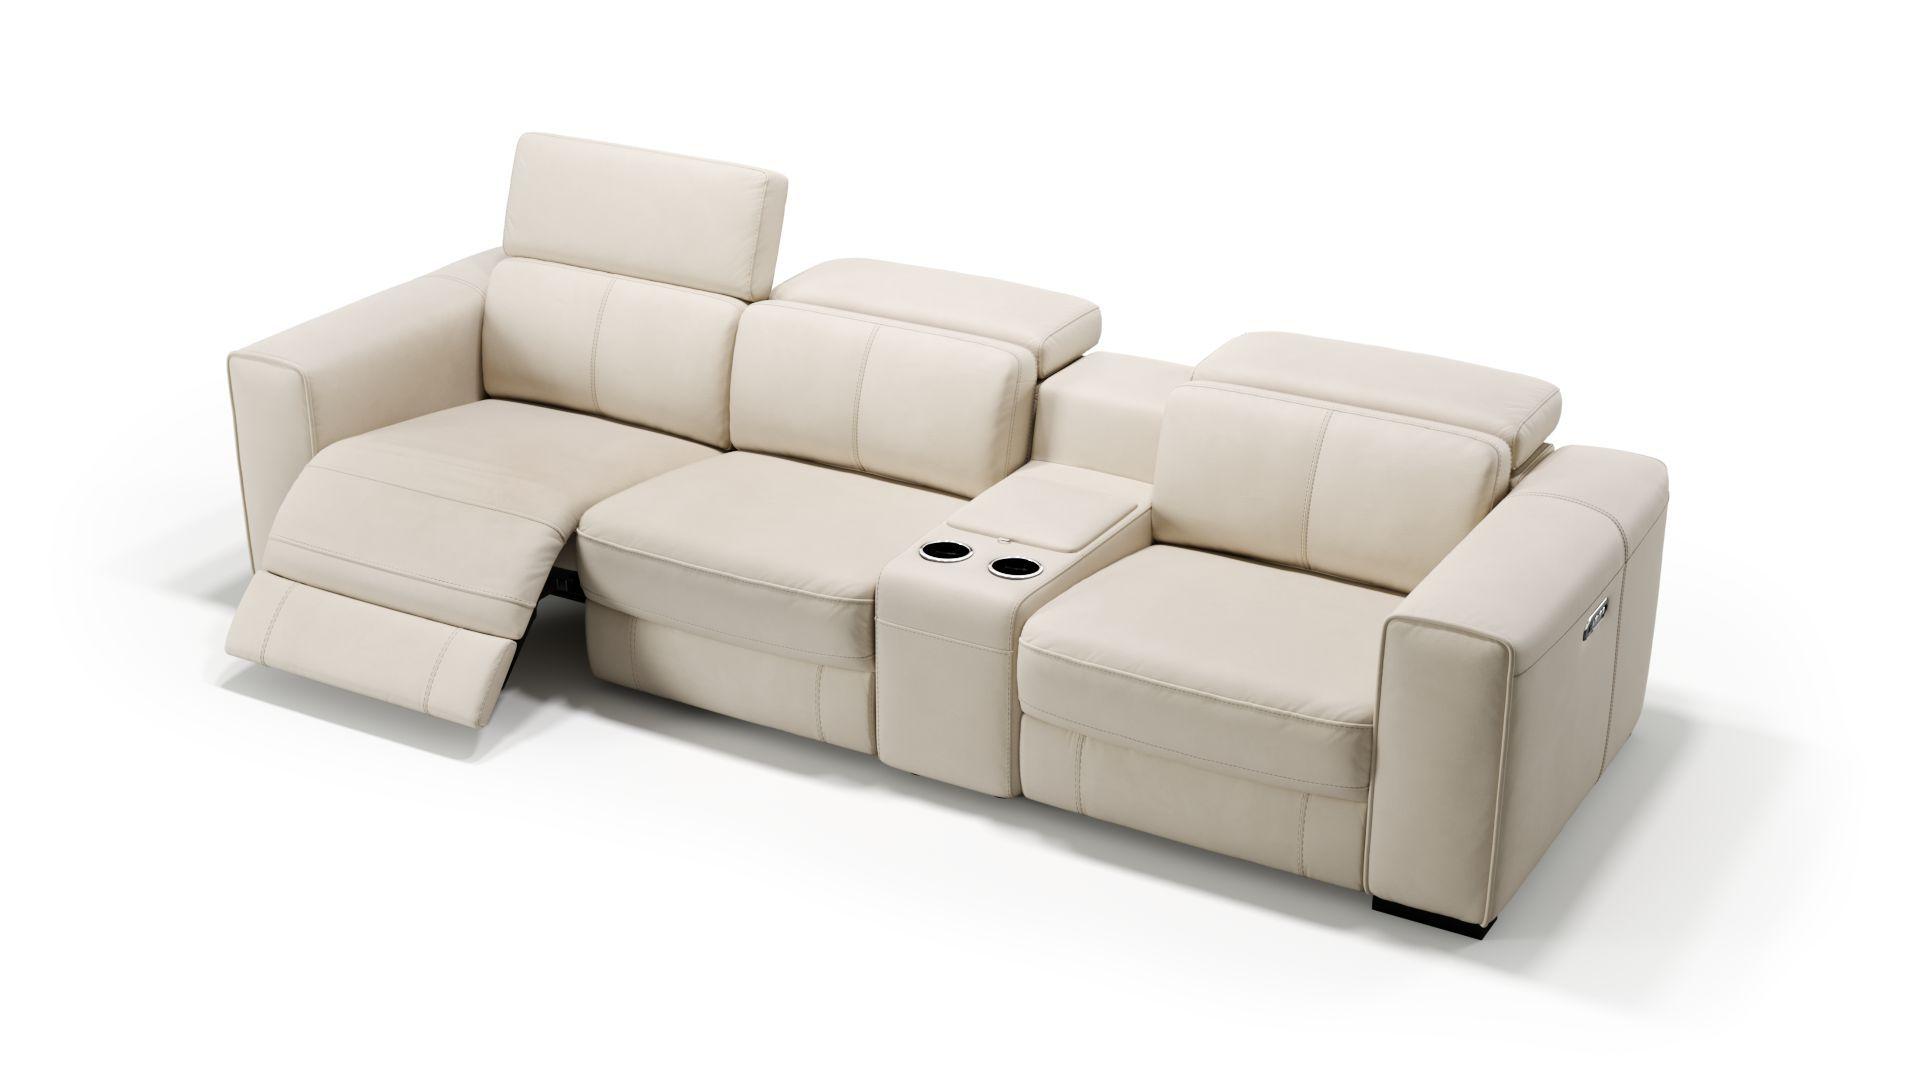 Full Size of Heimkino Sofa Leder Couch Elektrisch Himolla Relaxsofa Fernsehsofa Recliner Xora Musterring 3 Sitzer Elektrischer Relaxfunktion Kaufen Kinosofa Bovino 3er Sofa Heimkino Sofa